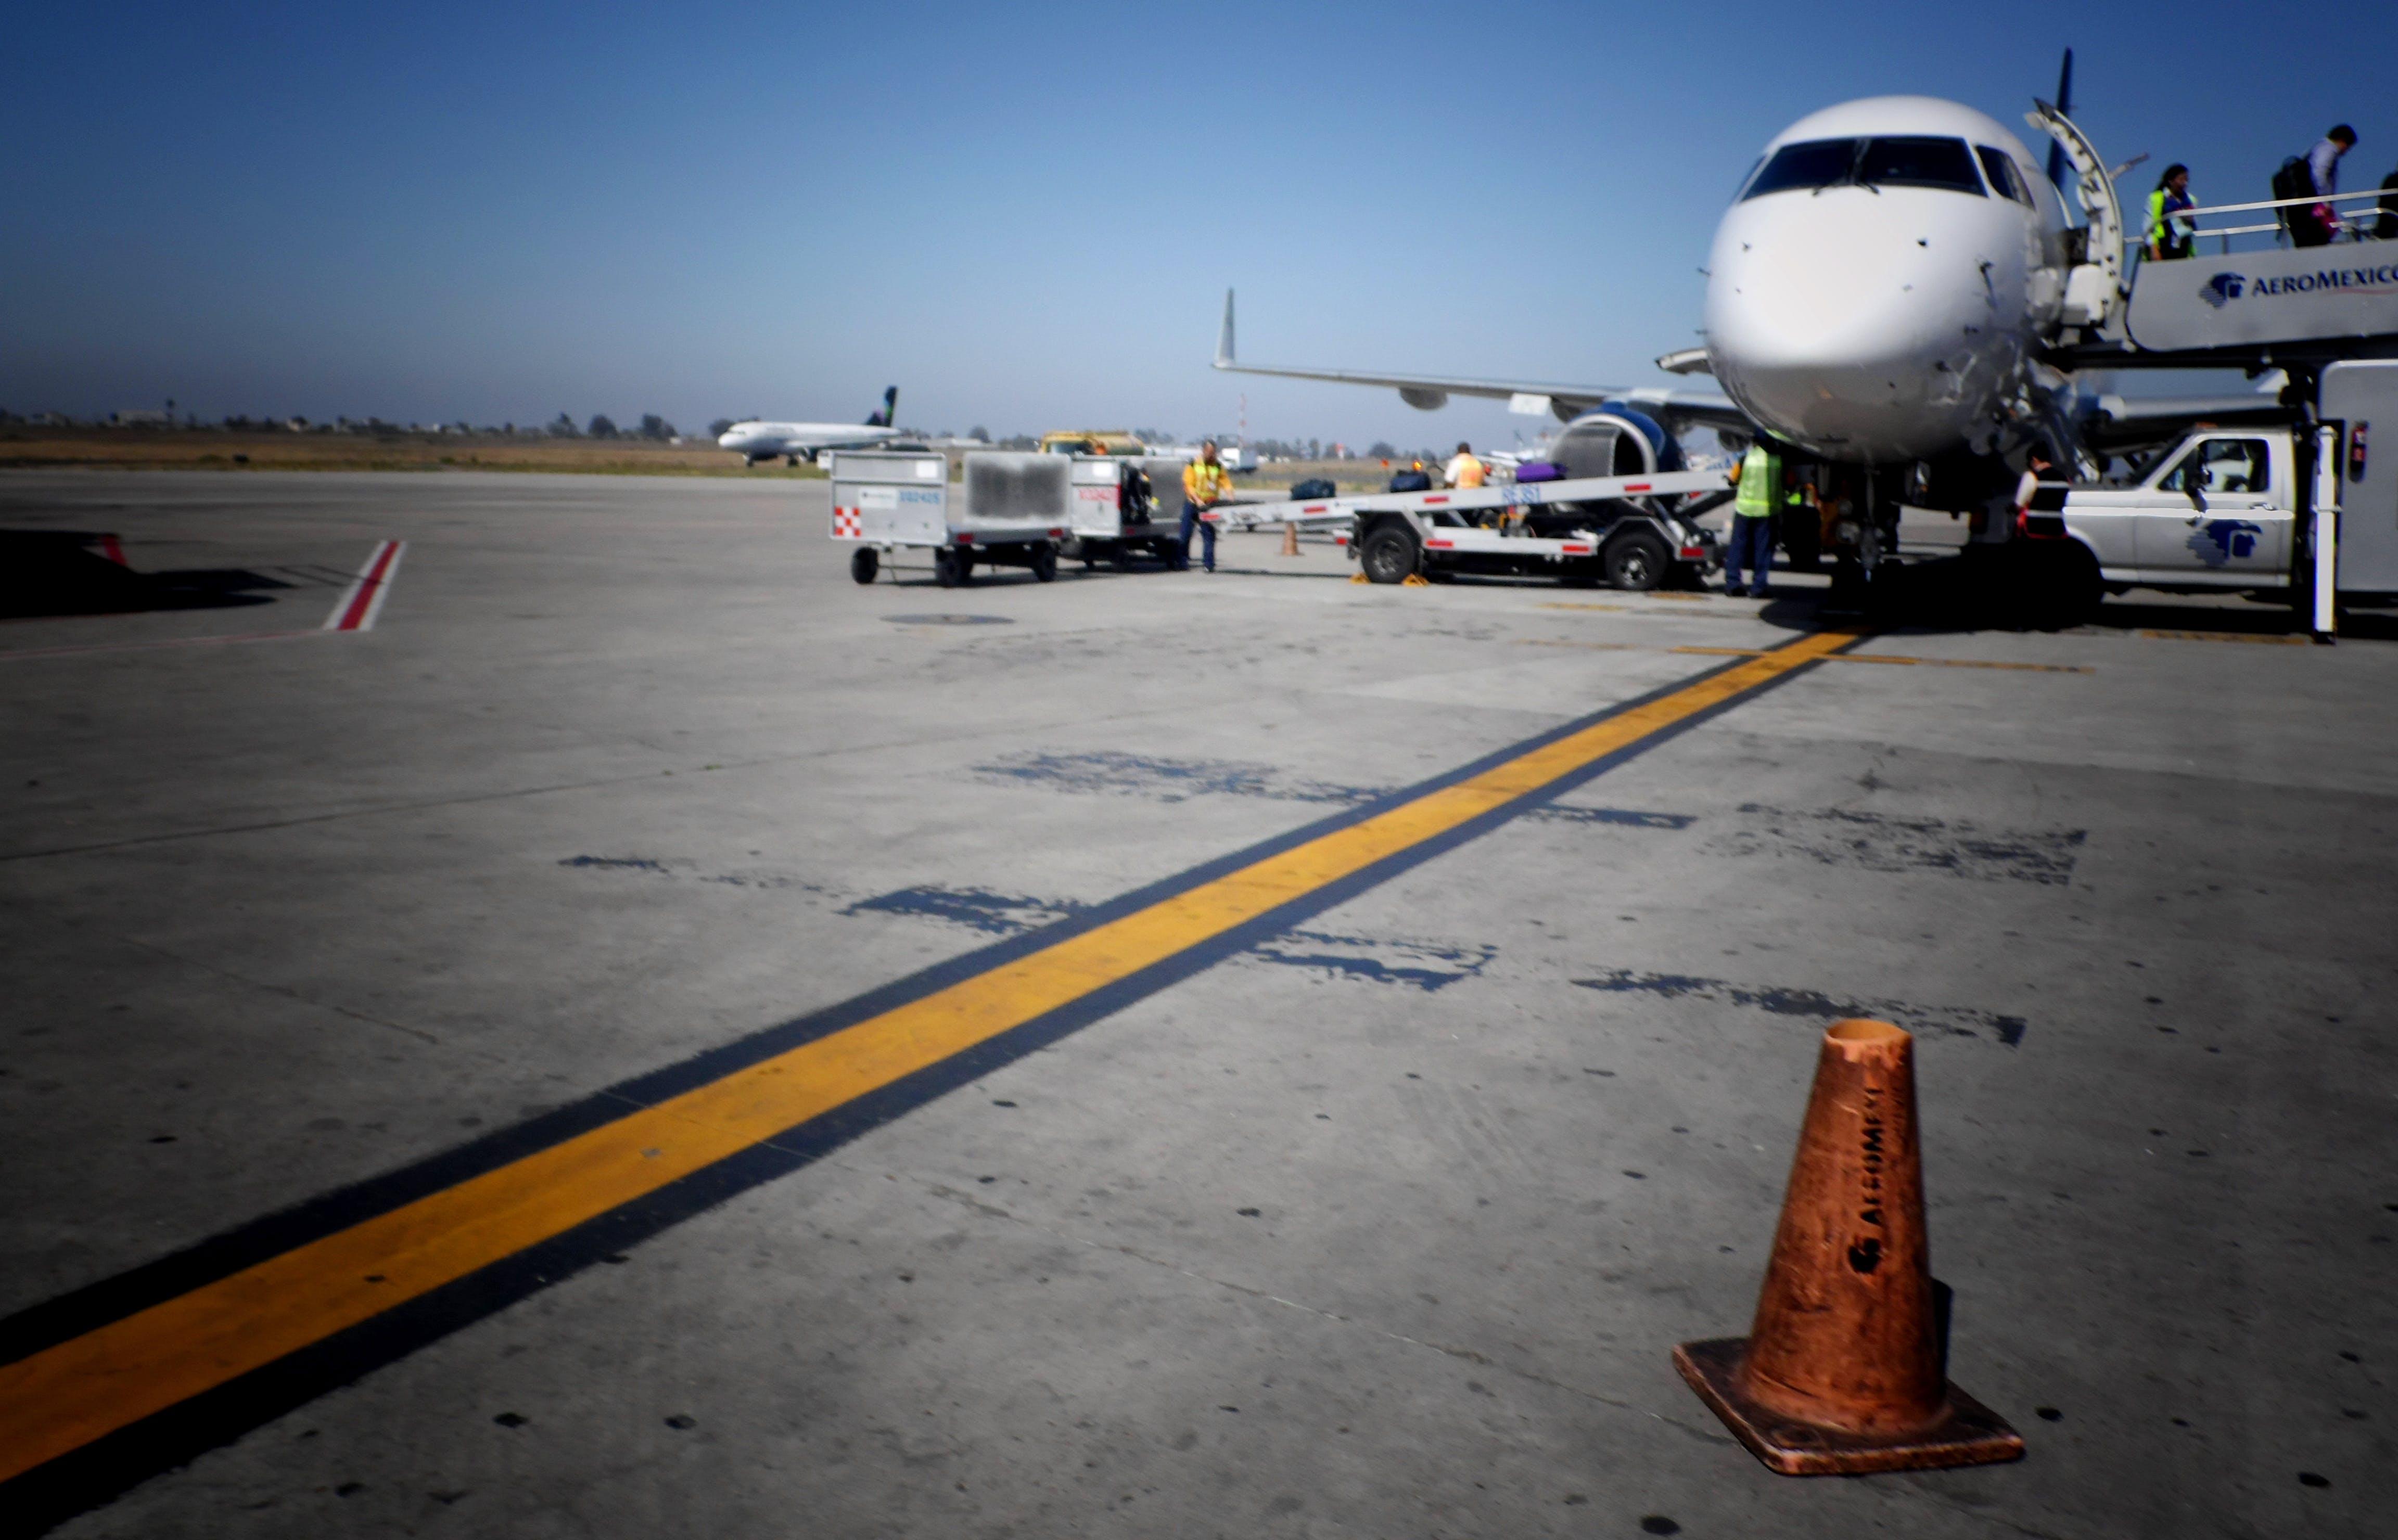 Free stock photo of Aeropuerto, avion